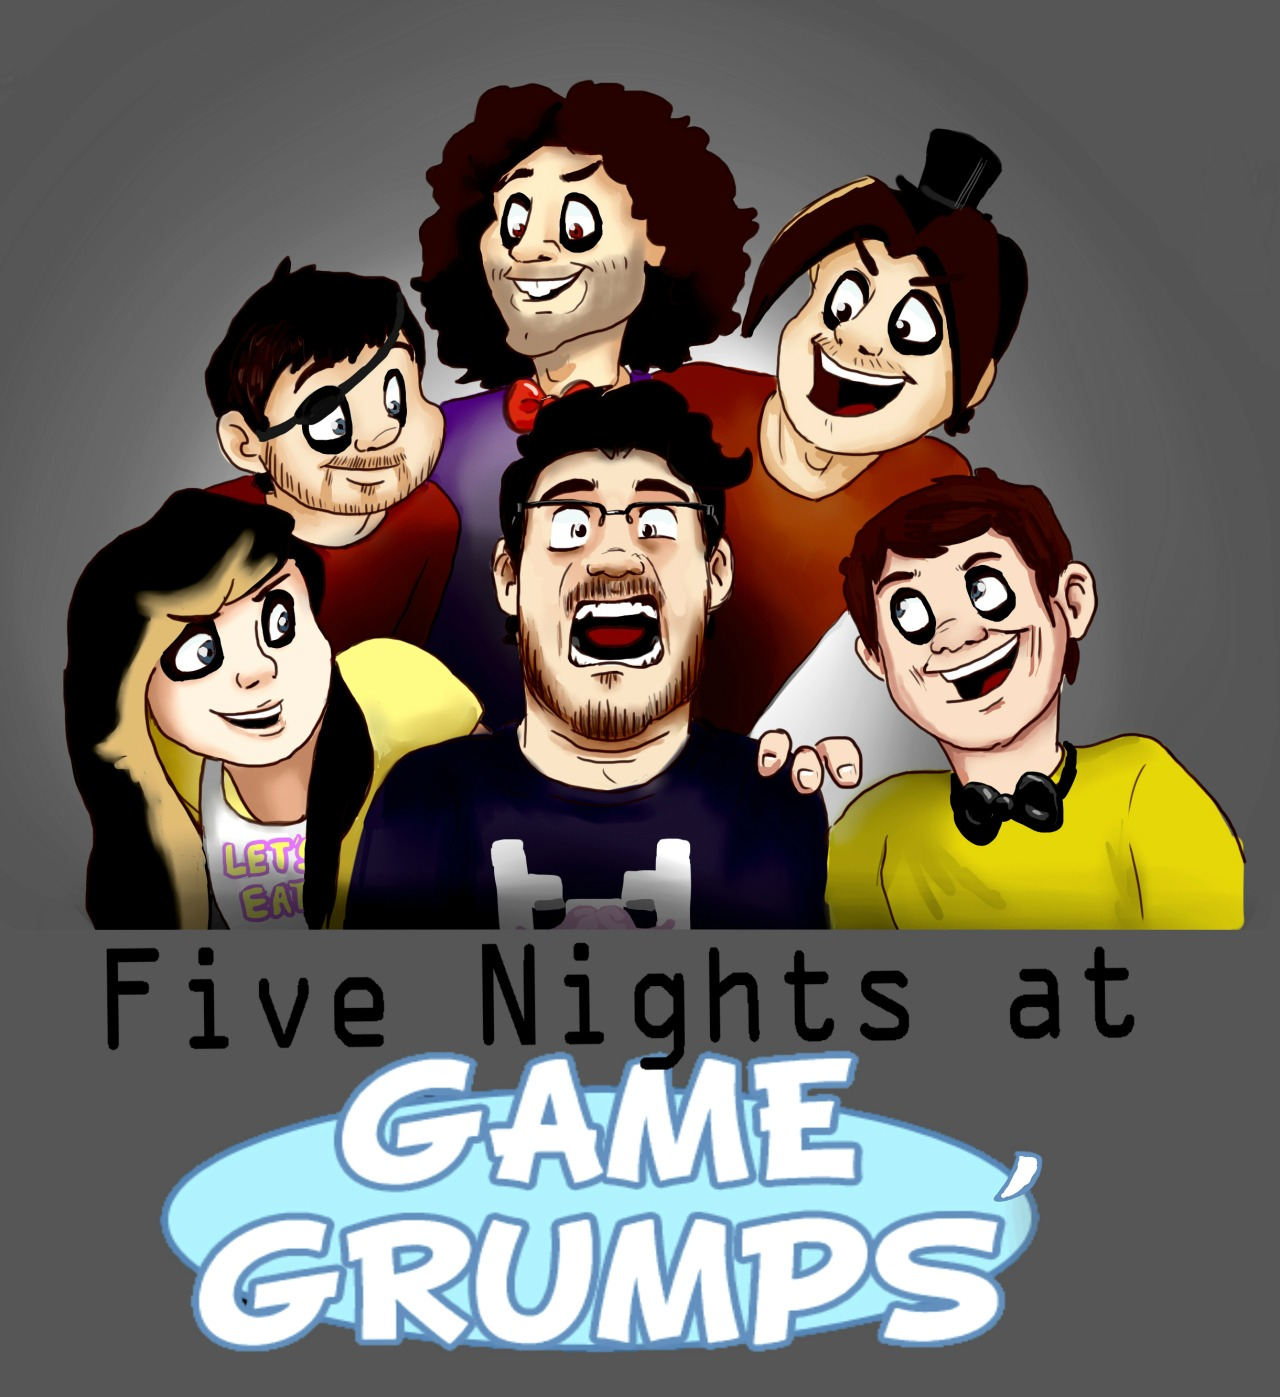 Markiplier Plays Five Nights At Game Grumps Markiplier